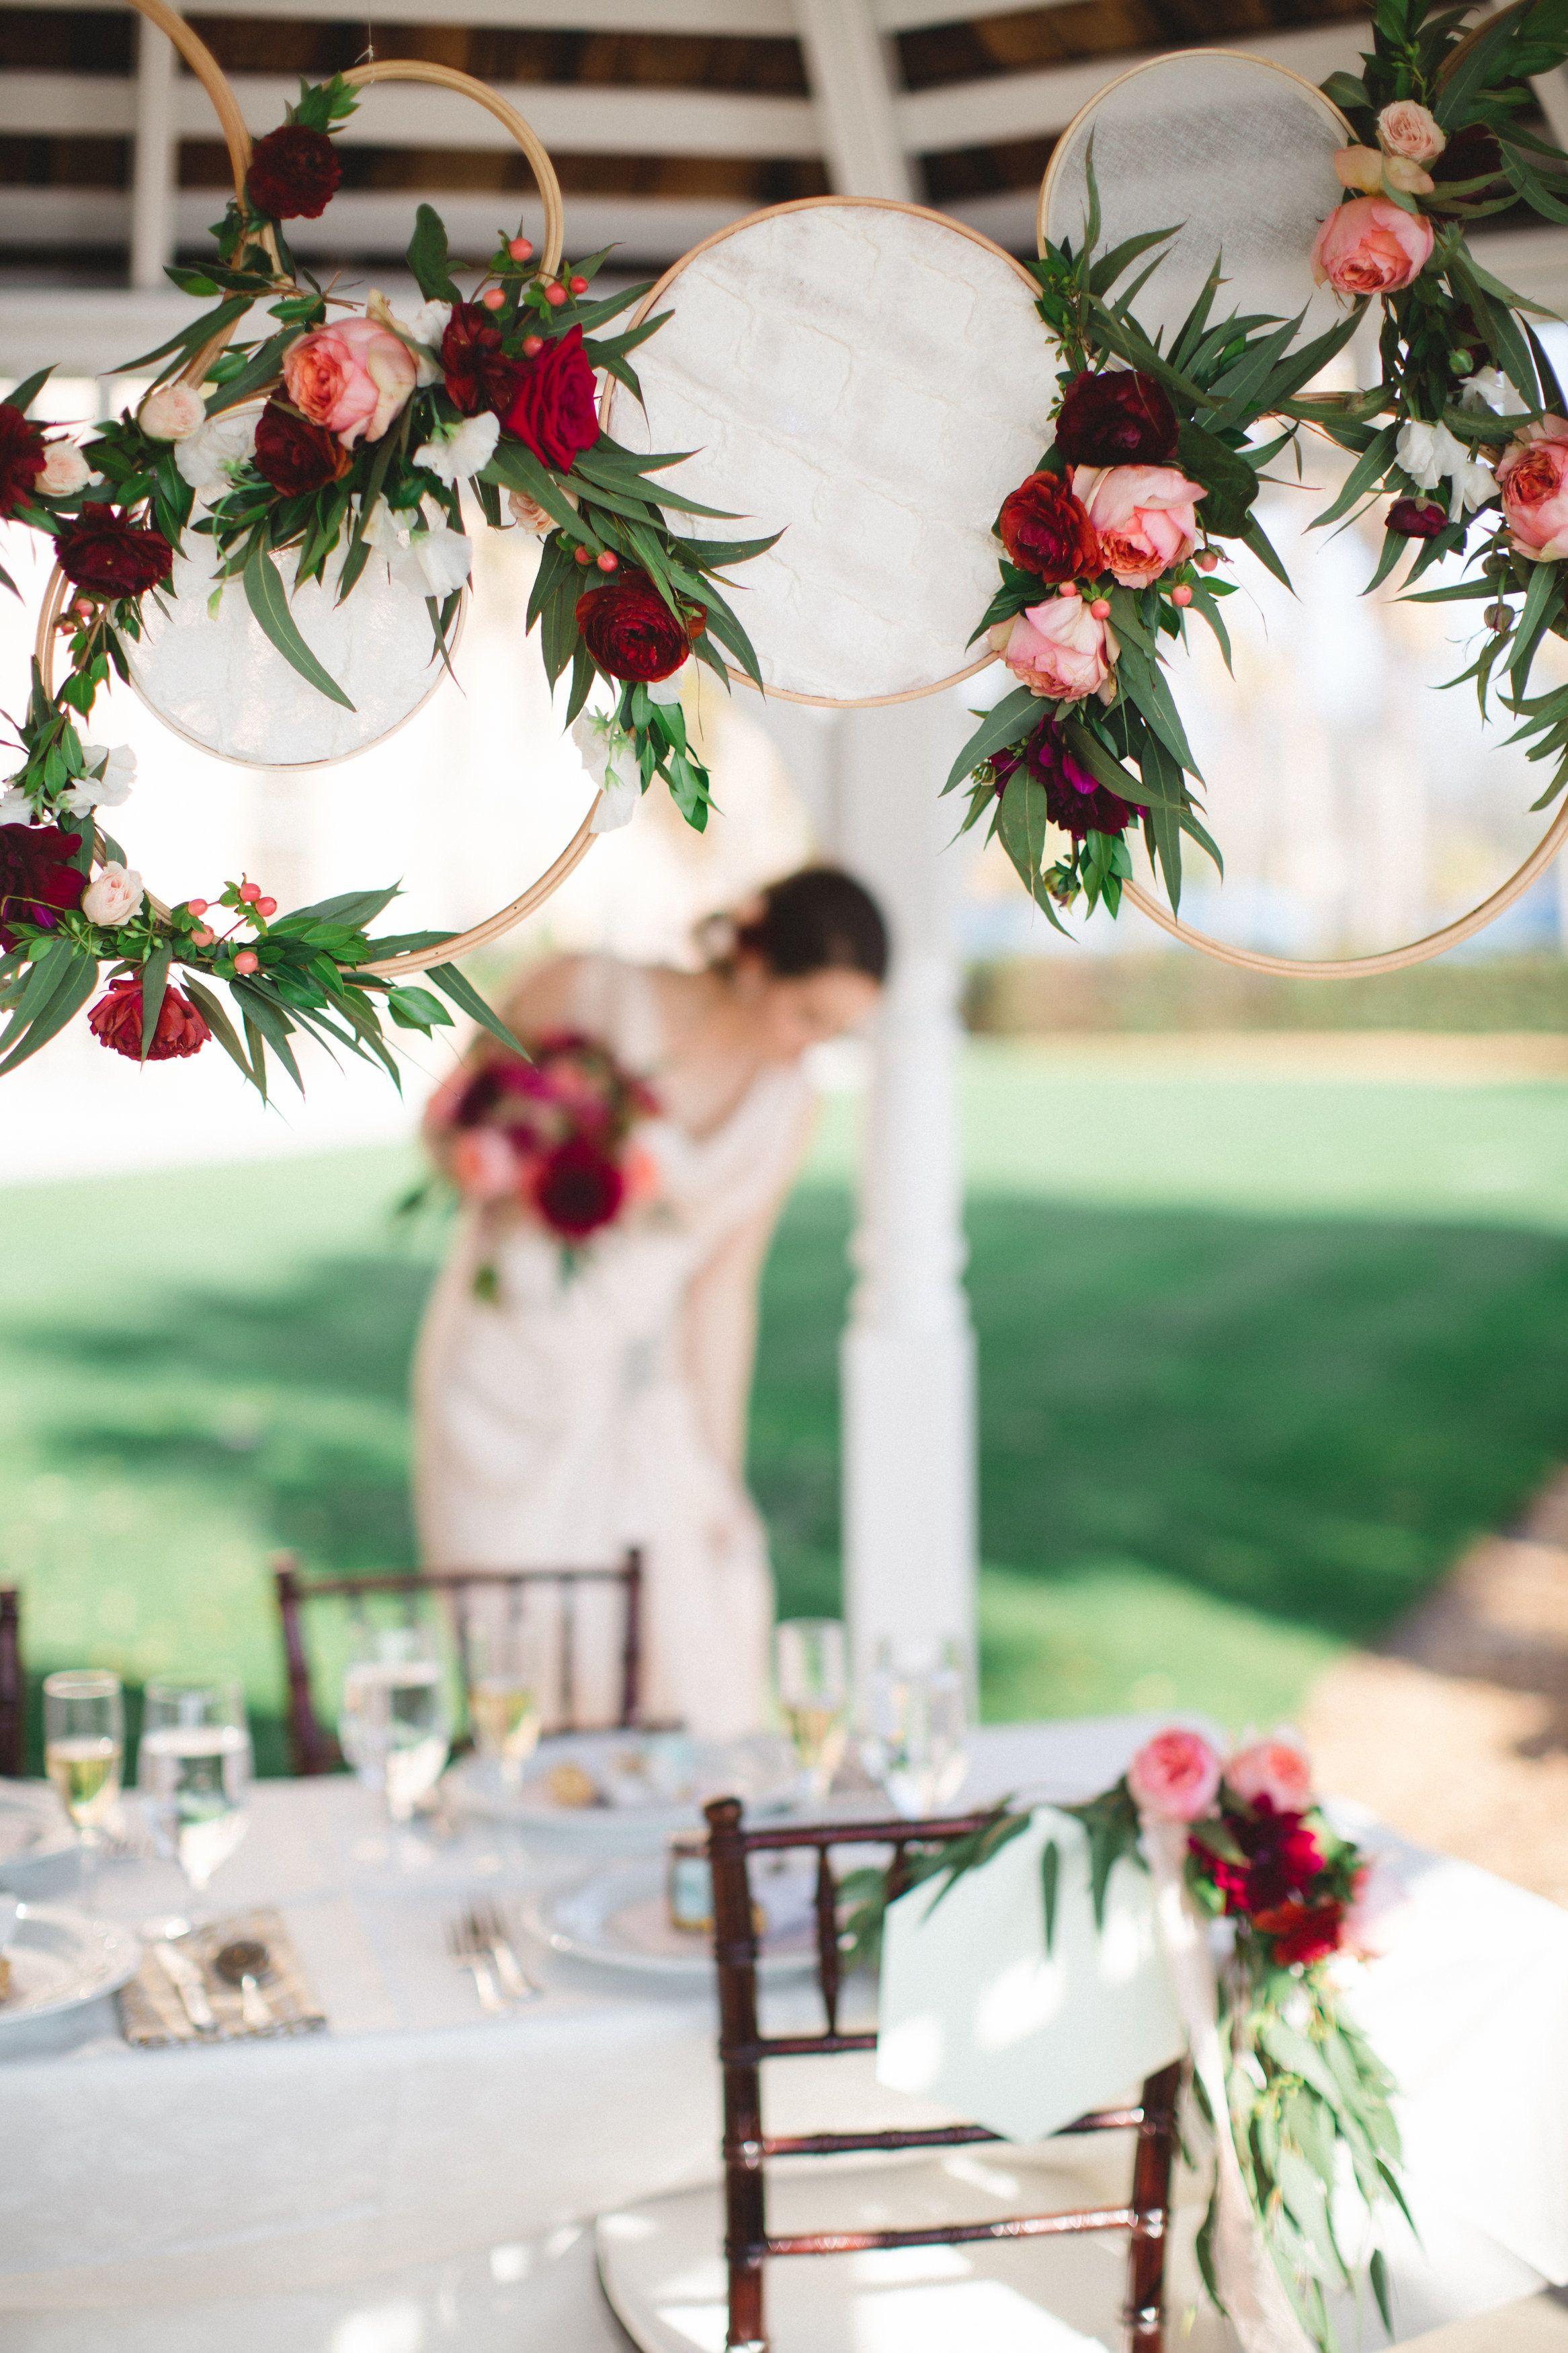 Romantic Georgian Wedding Inspiration The Wedding Planner In Me